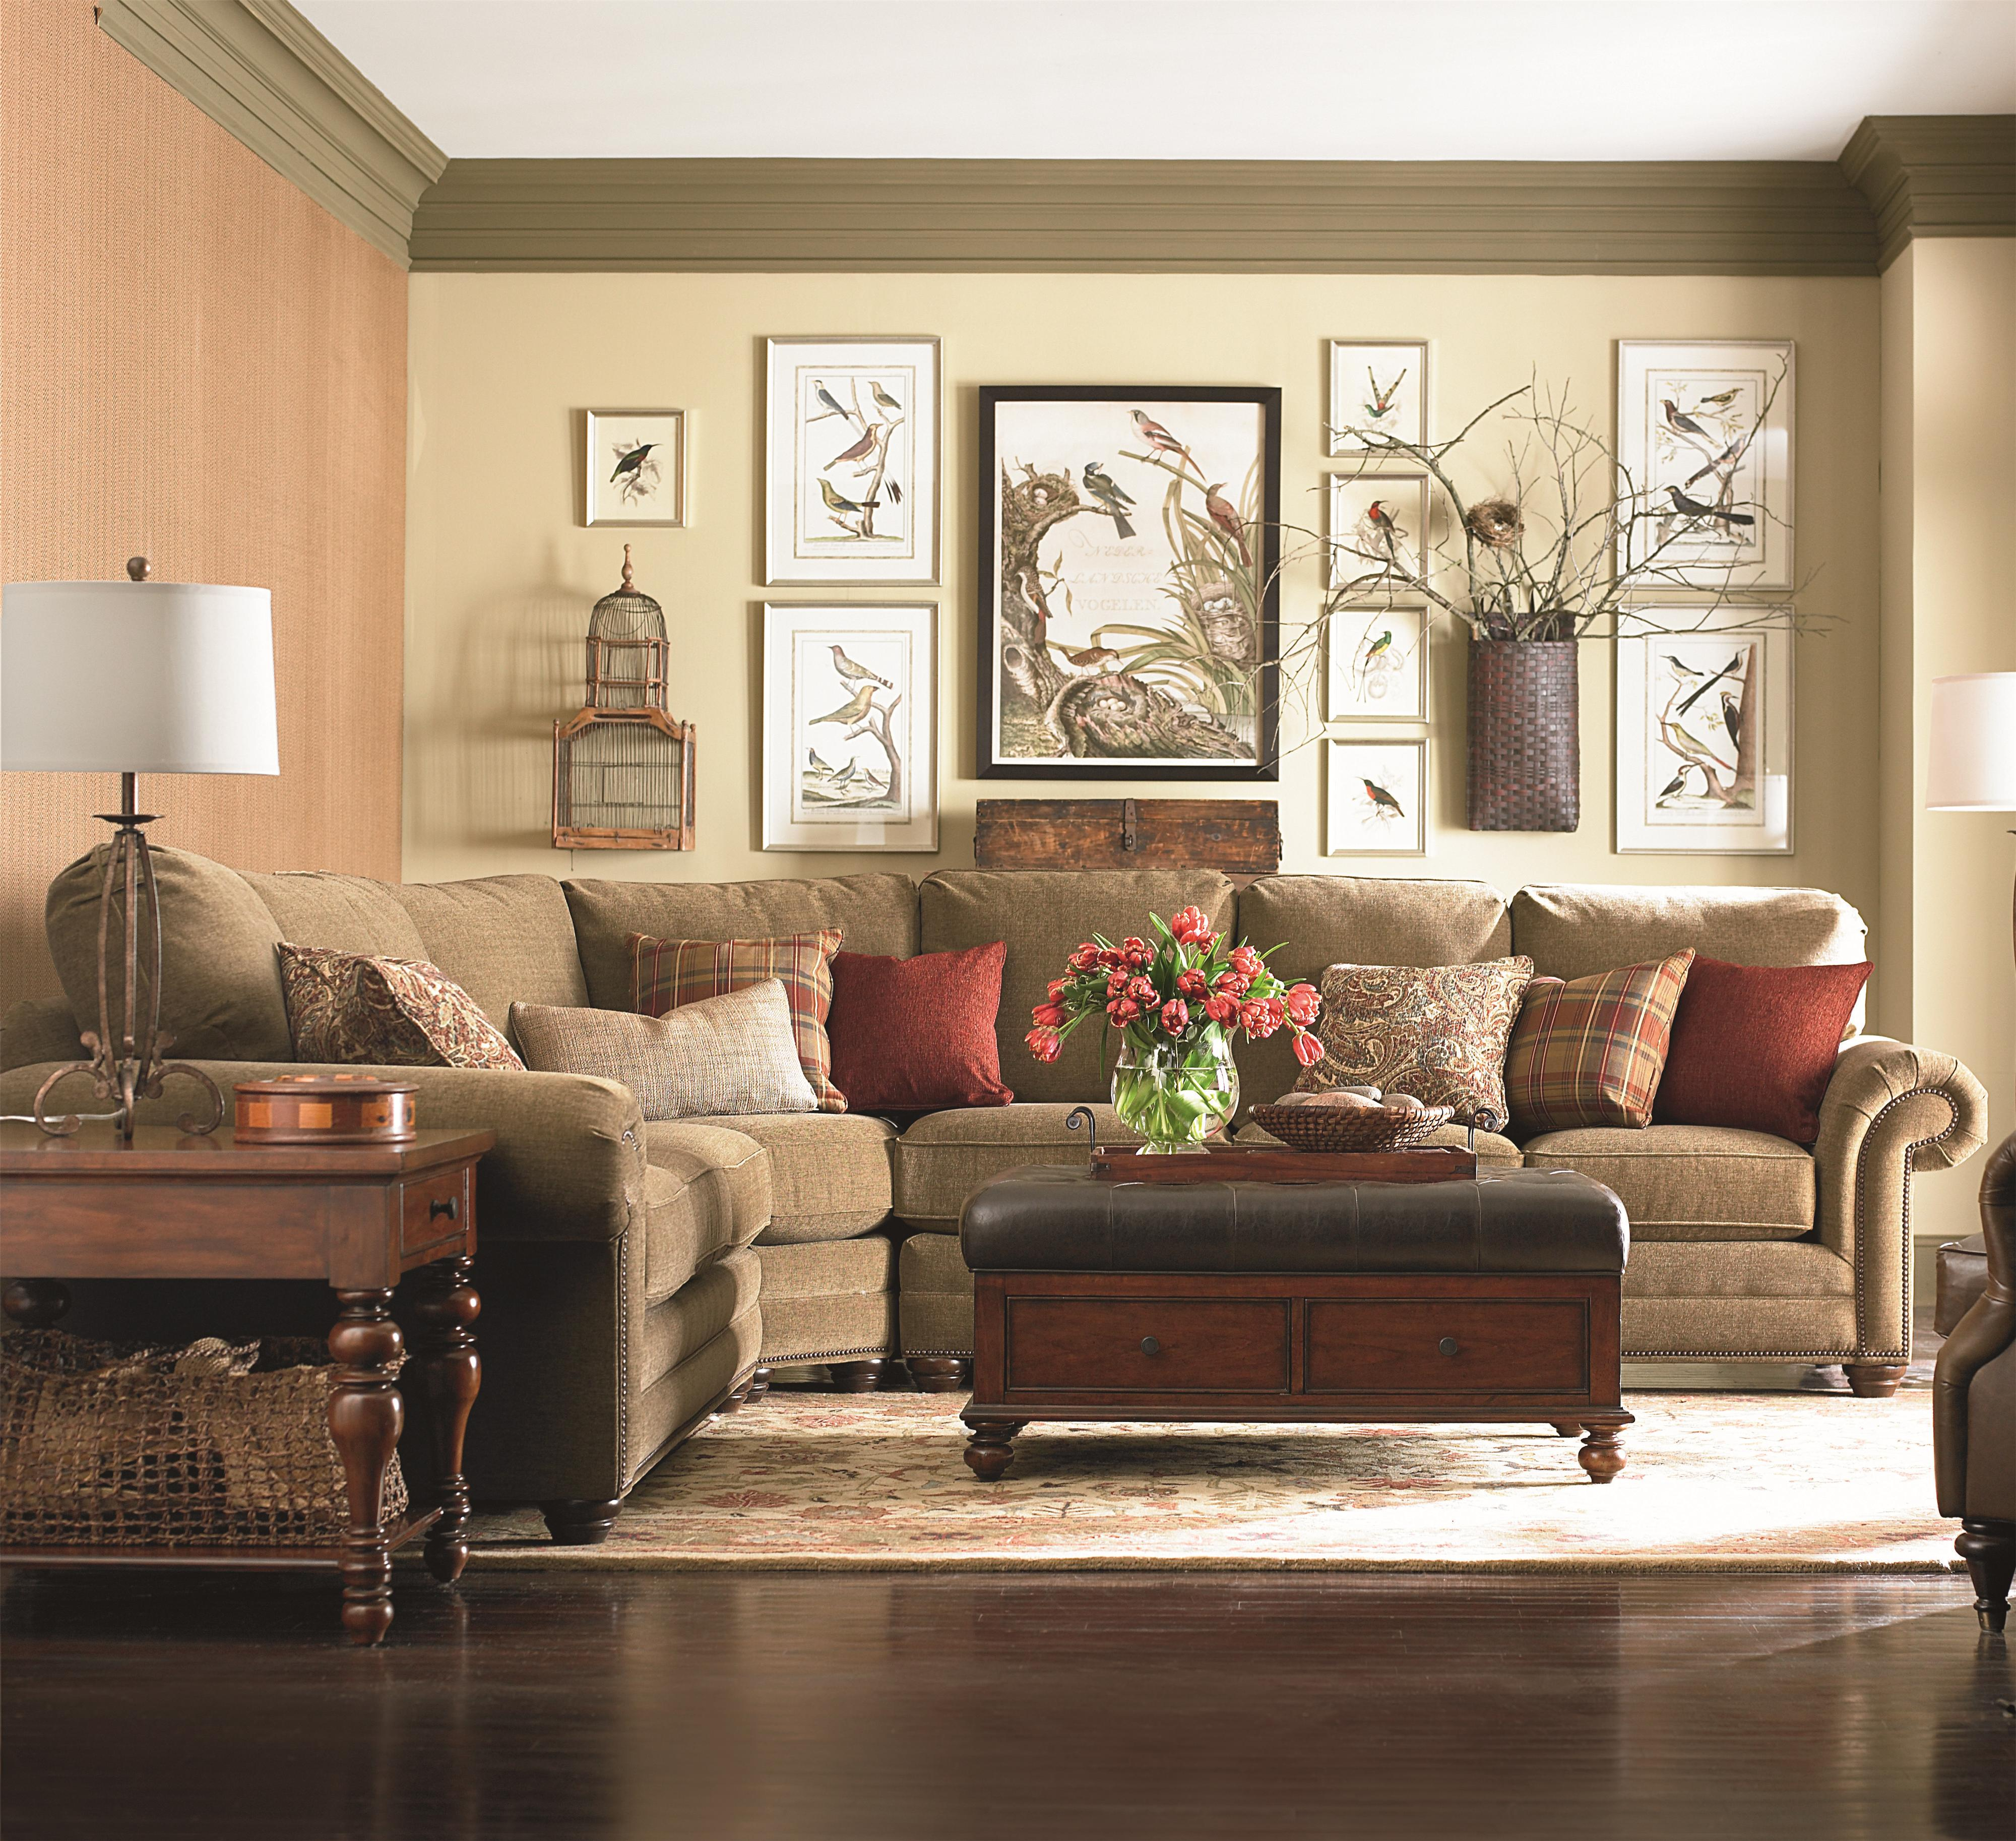 Bassett Custom Upholstery   Manor U003cbu003eCustomizableu003c/bu003e 3 Pc. Sectional With  Nailhead Trim, Panel Arms And Turned Feet   AHFA   Sofa Sectional Dealer  Locator